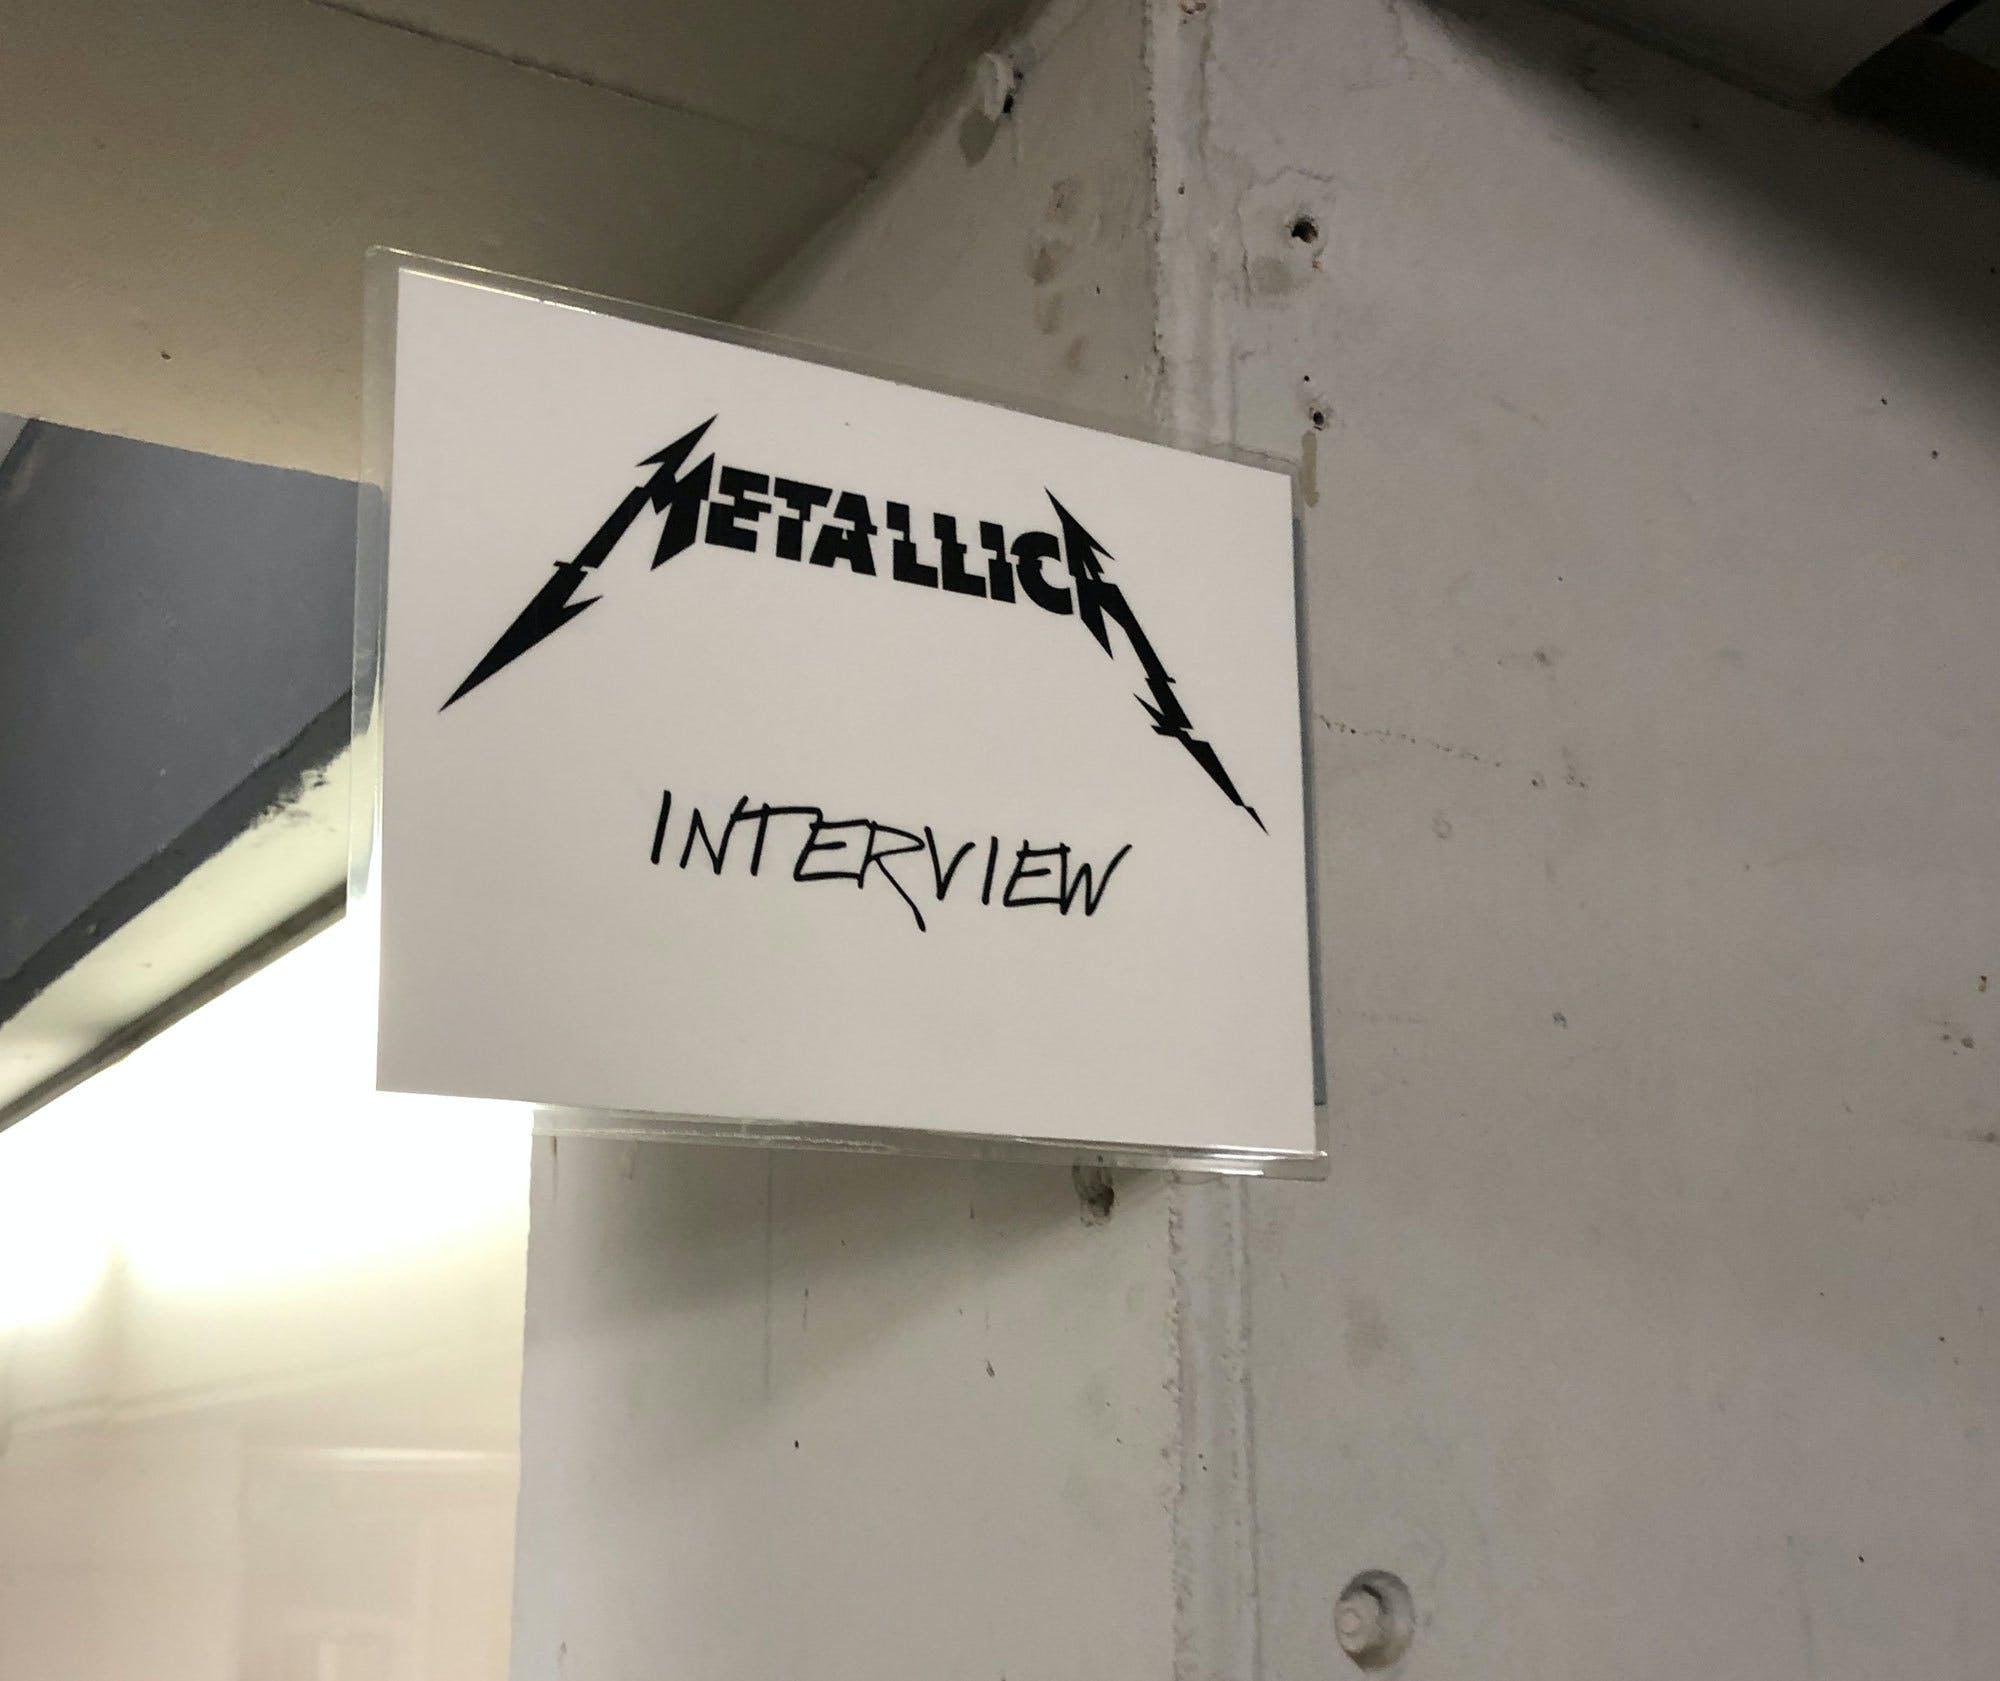 Metallica interview sign backstage